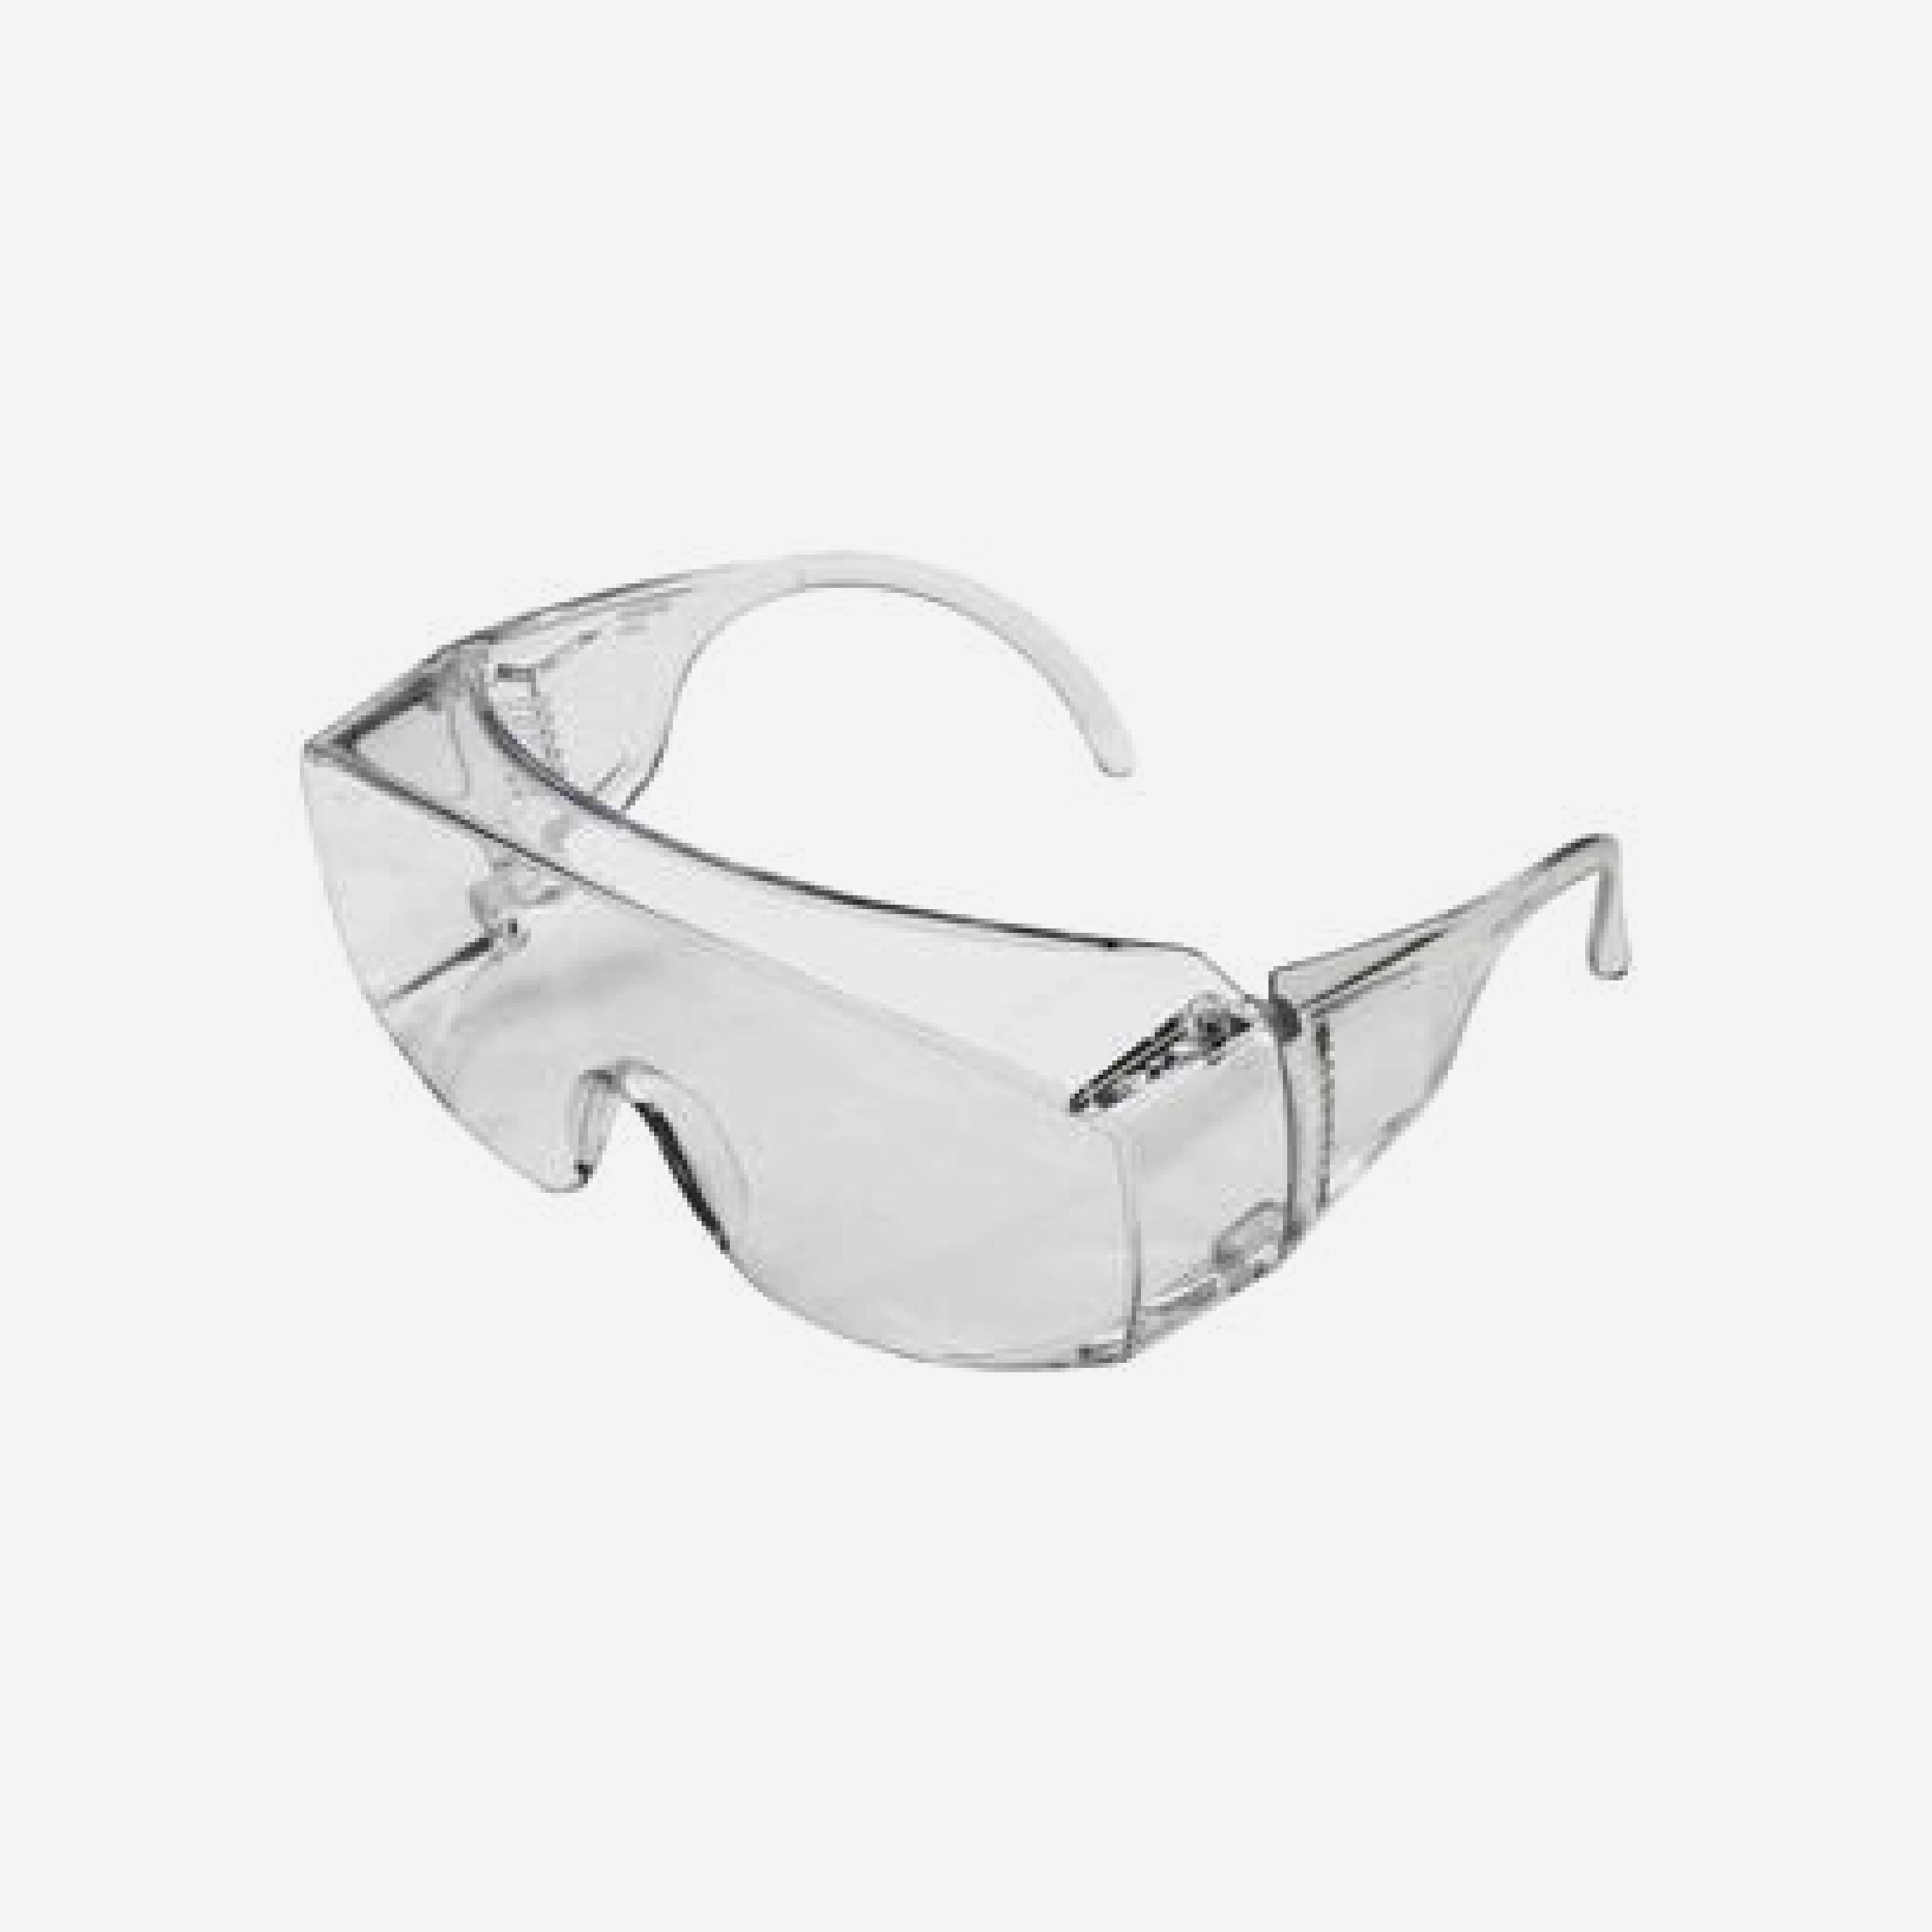 Óculos   Mercury cinza   Vicsa - Granville Equipamentos de Segurança ... ac3b67de97